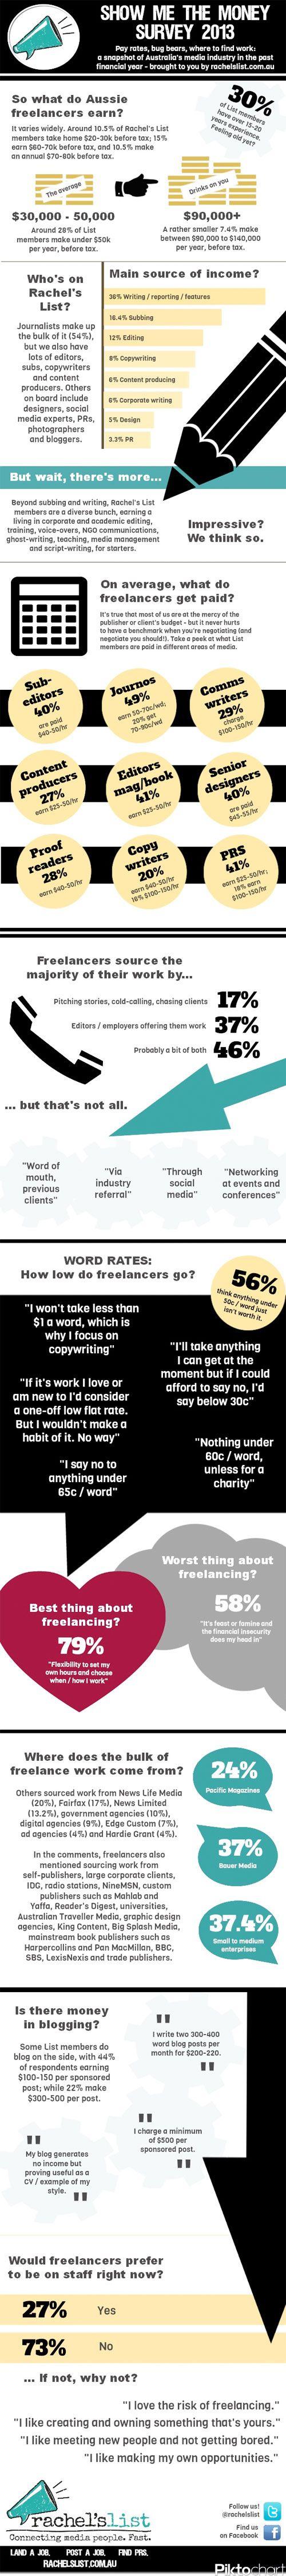 What do freelance writers earn in Australia?